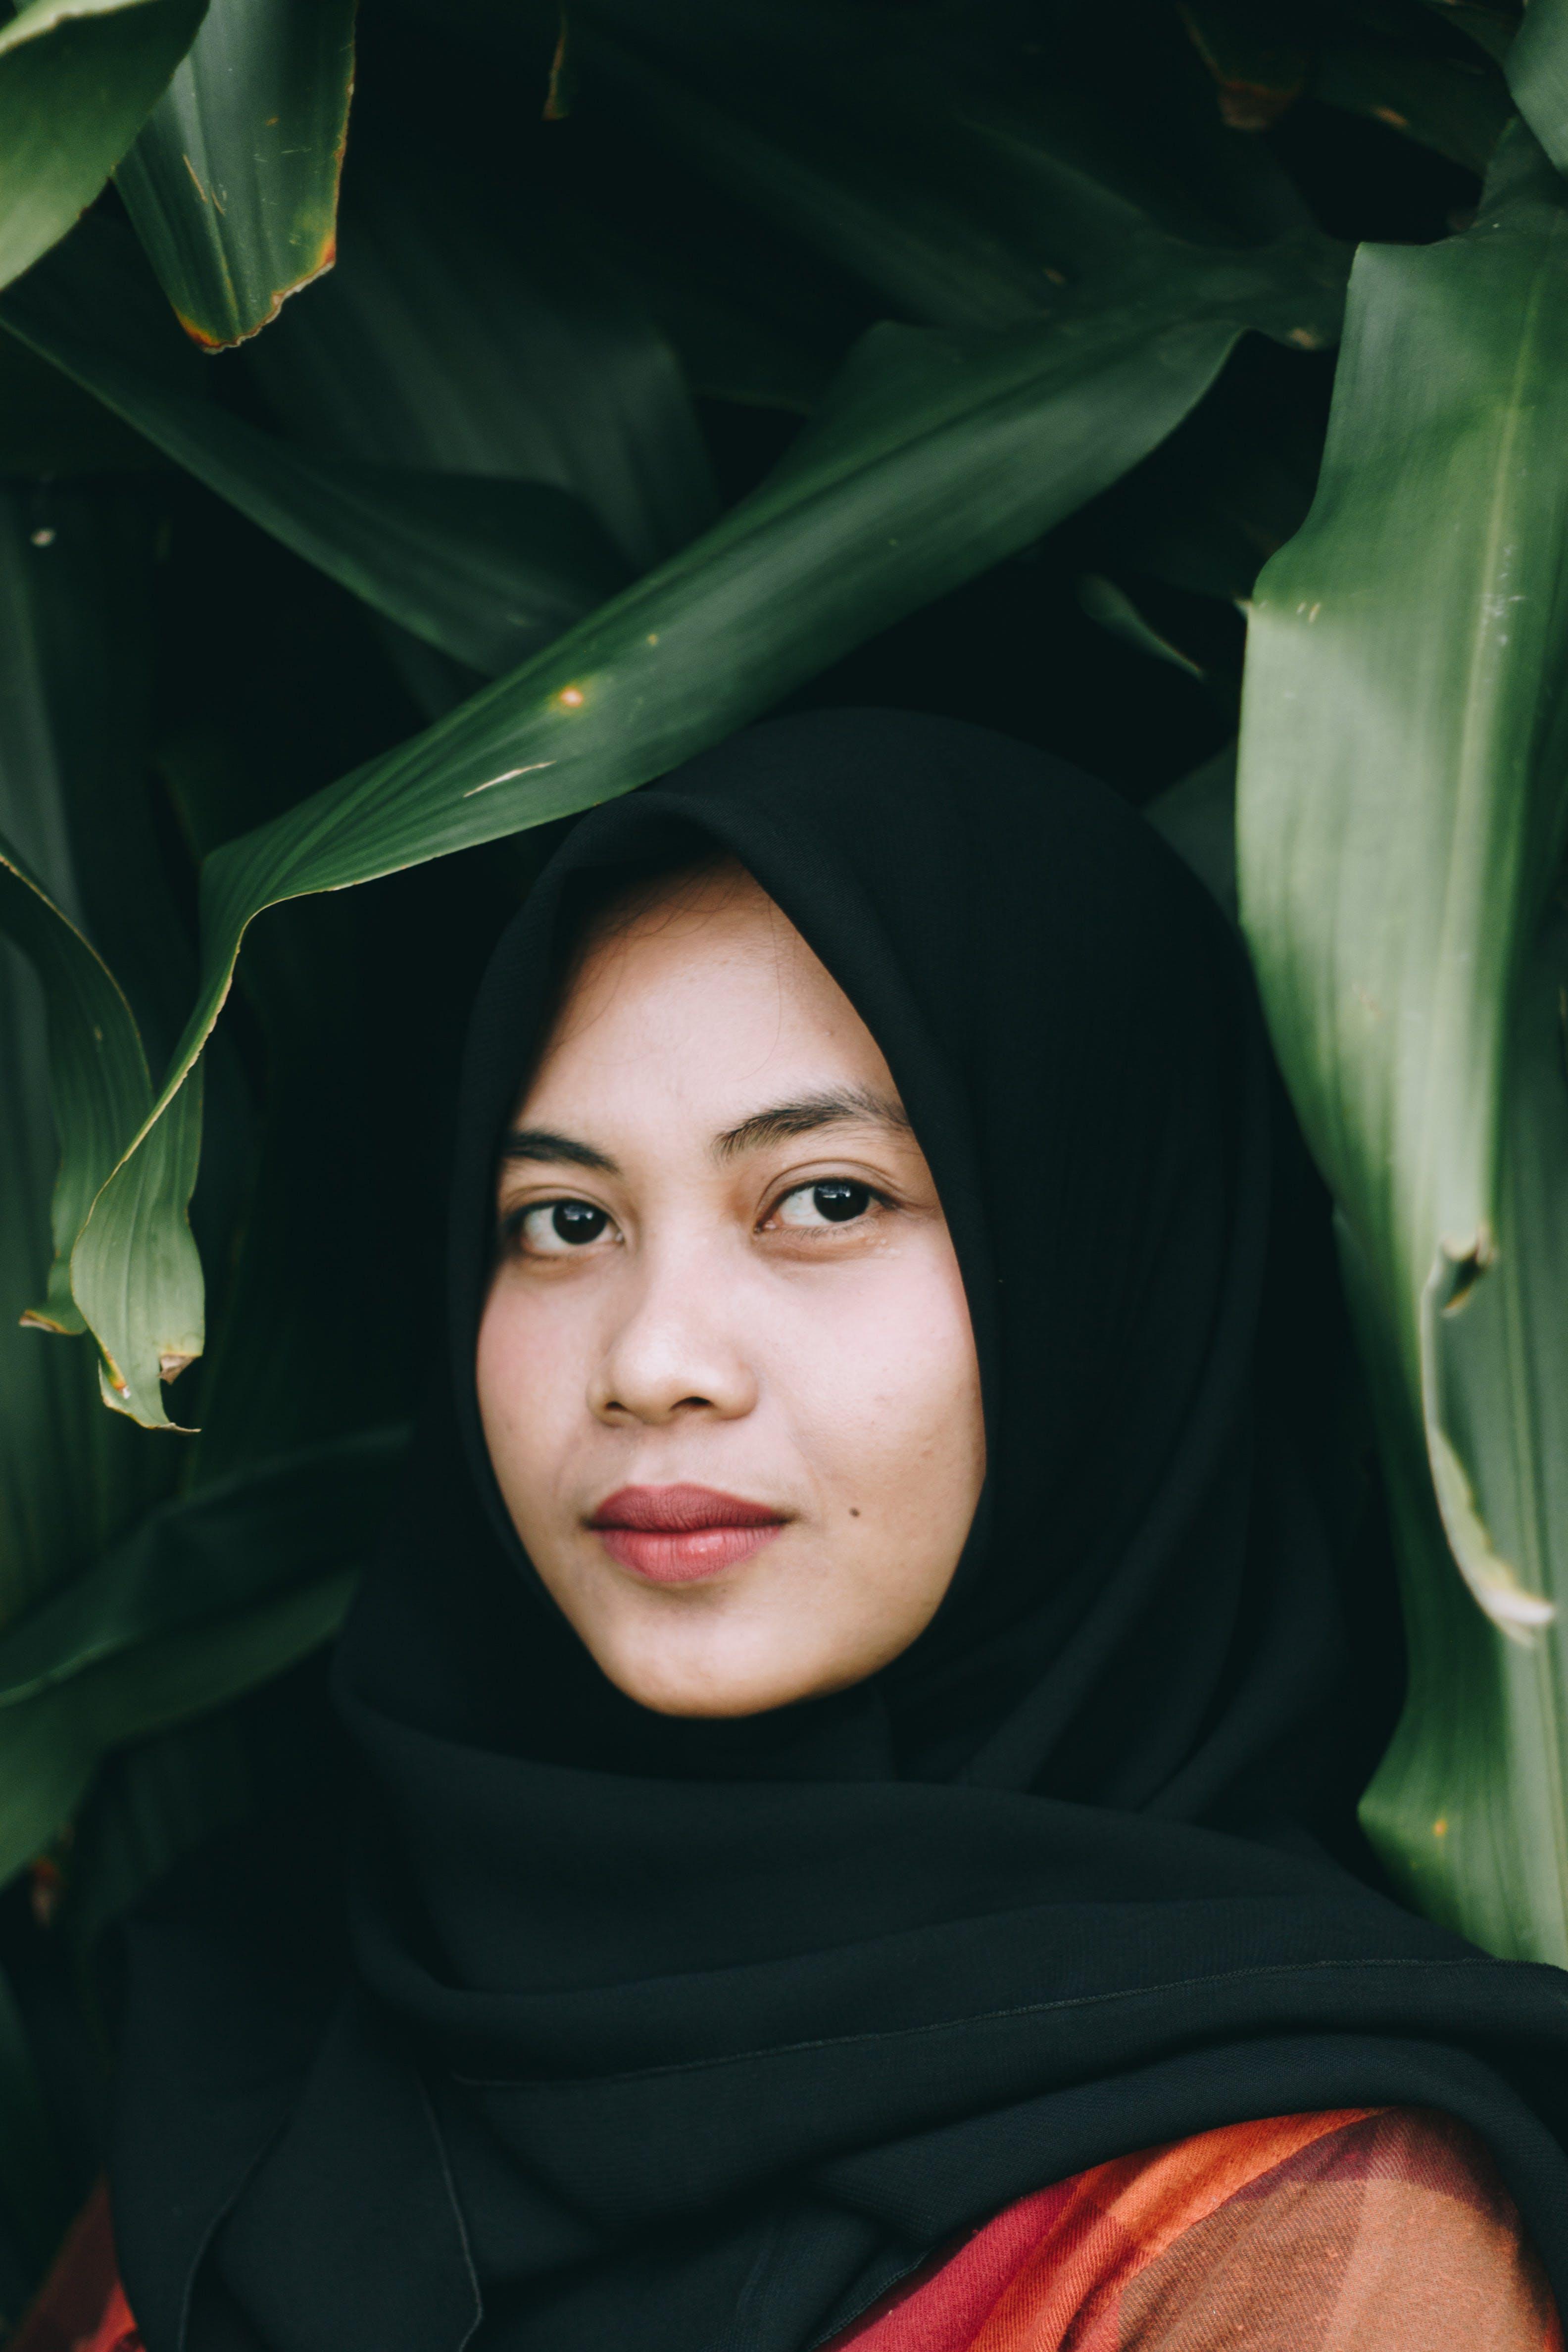 Photo of Woman Wearing Black Headscarf